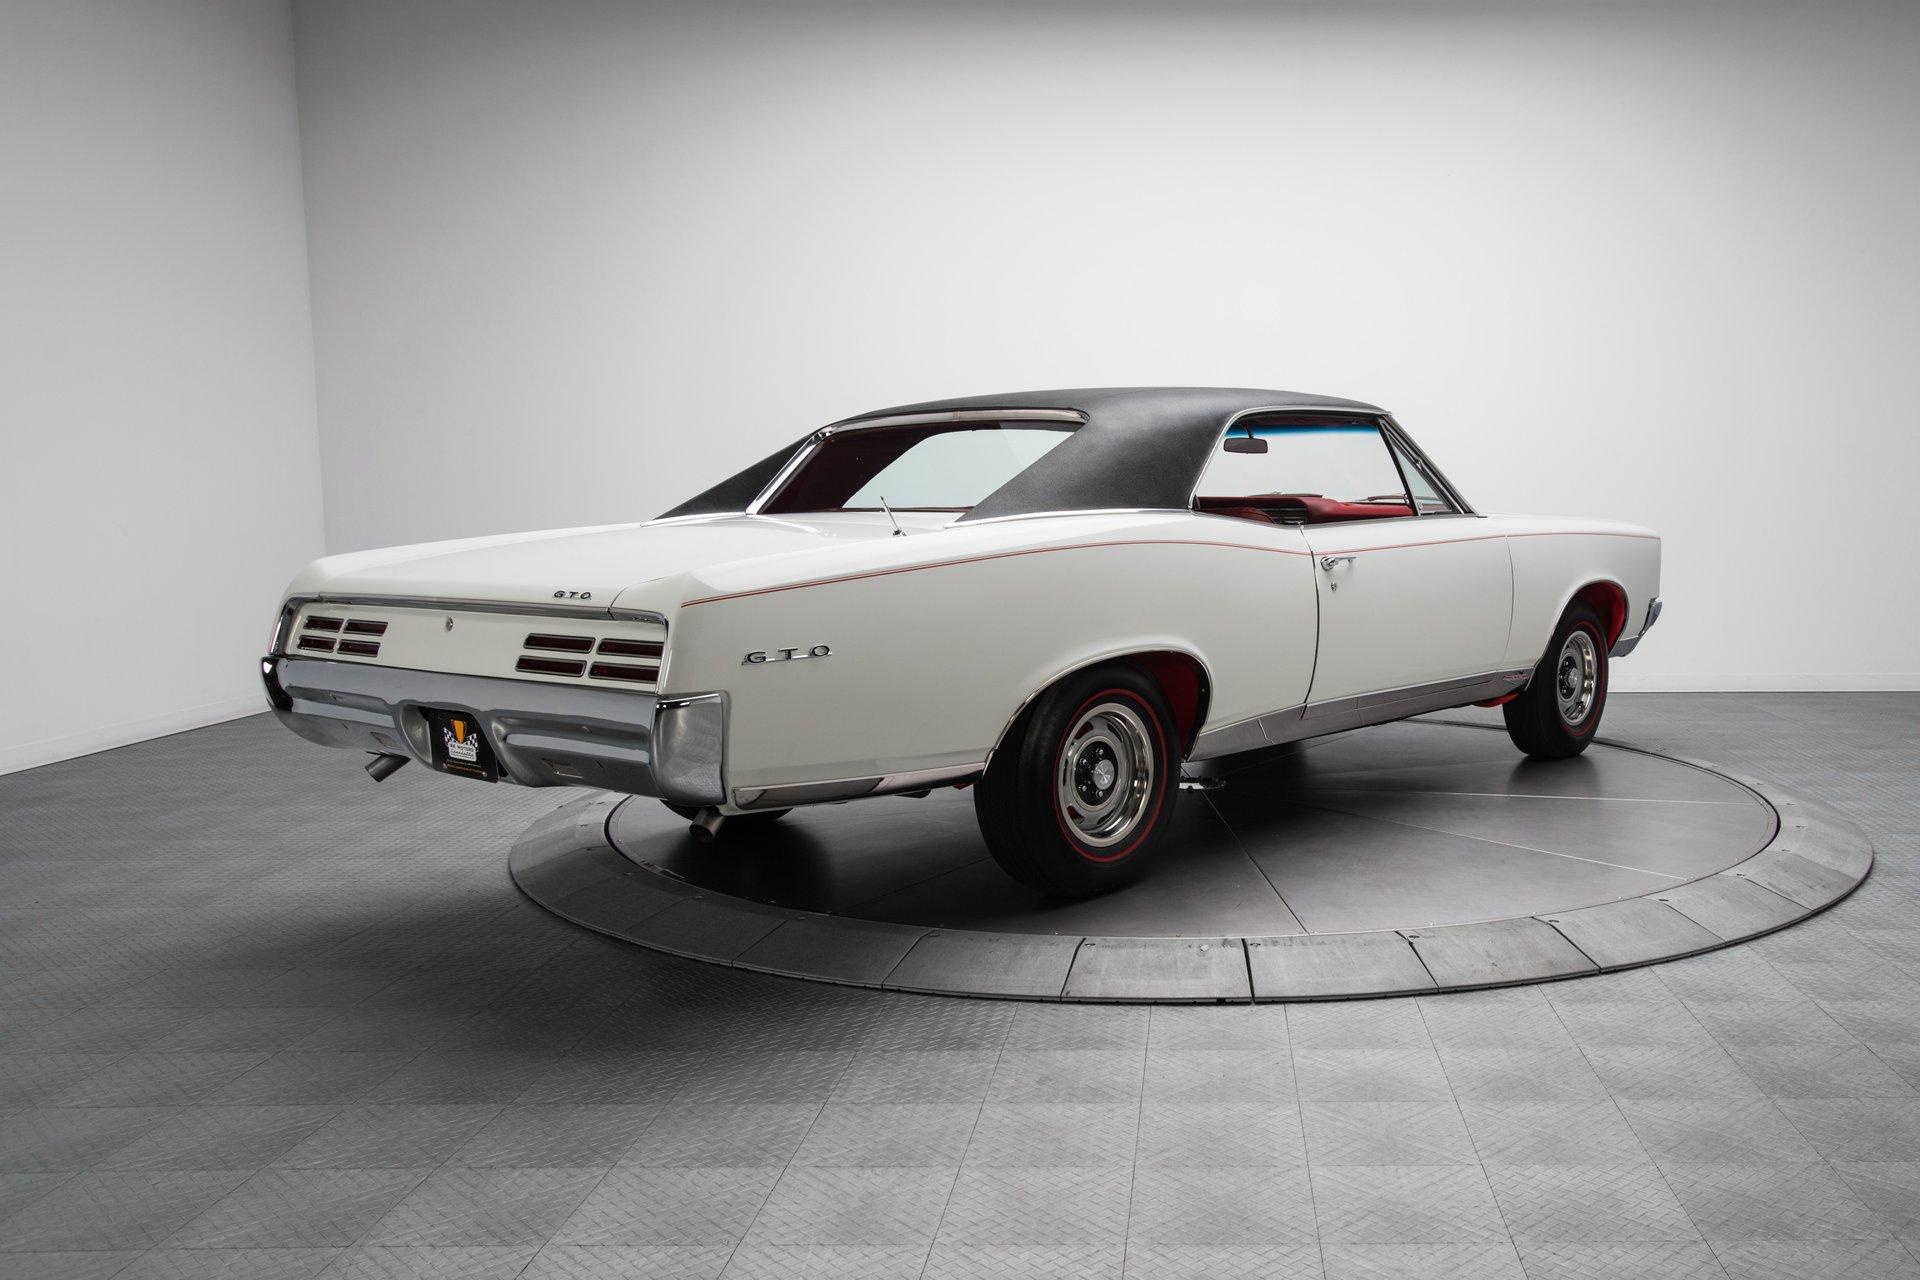 134648 1967 Pontiac GTO RK Motors Classic Cars for Sale